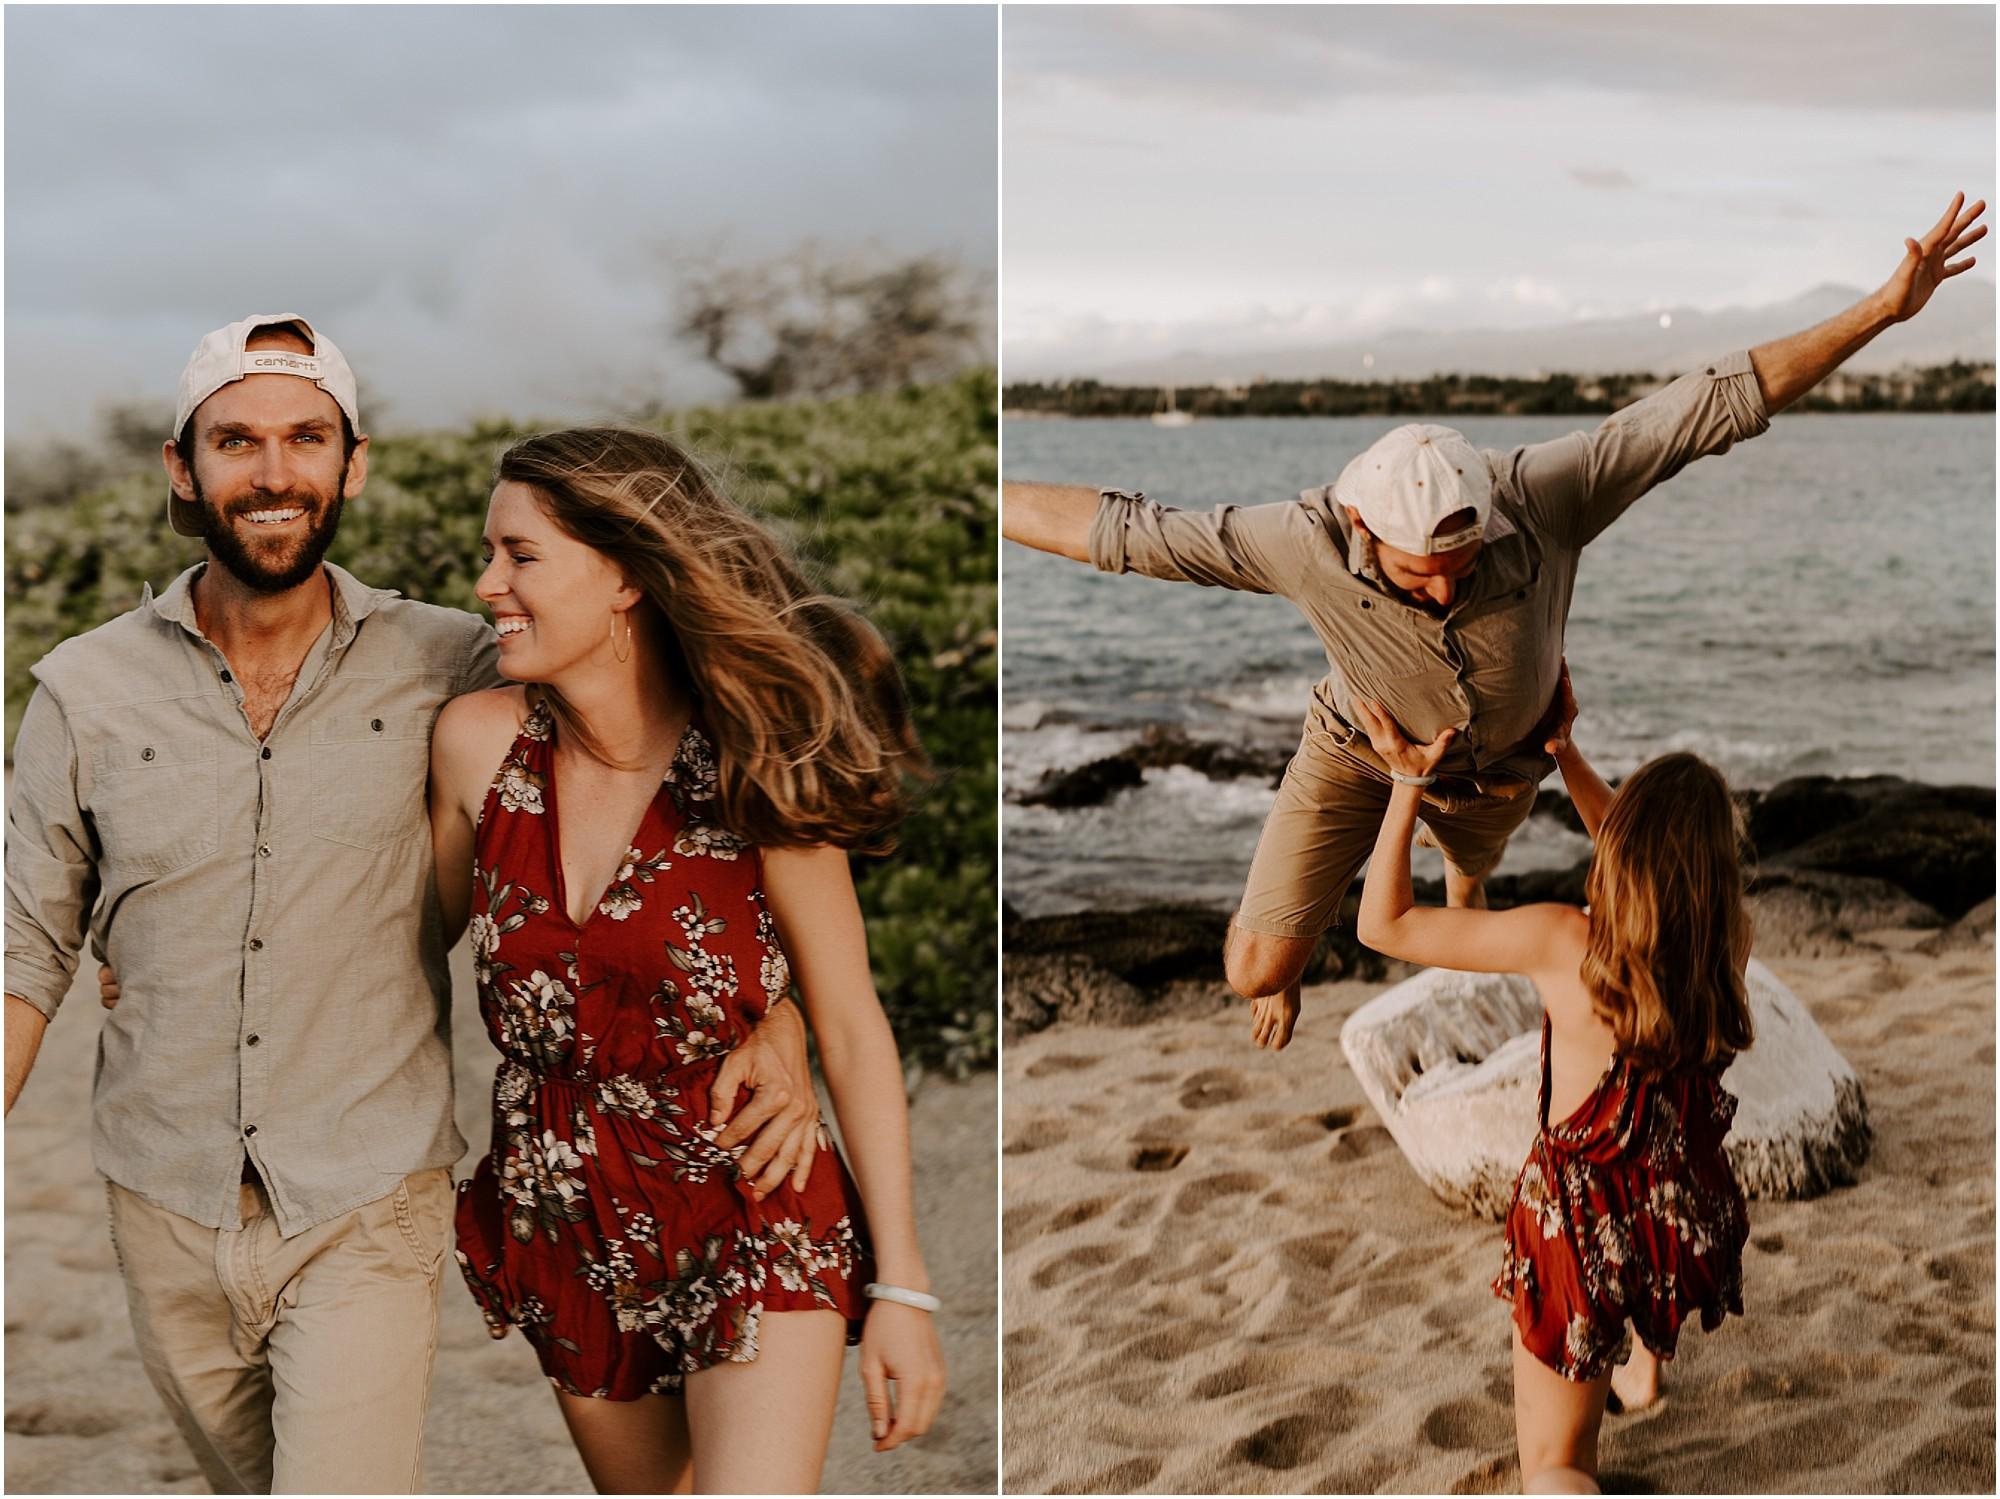 destination-elopement-photography-hawaii-photos-by-aloha-zoe-photography_0013.jpg